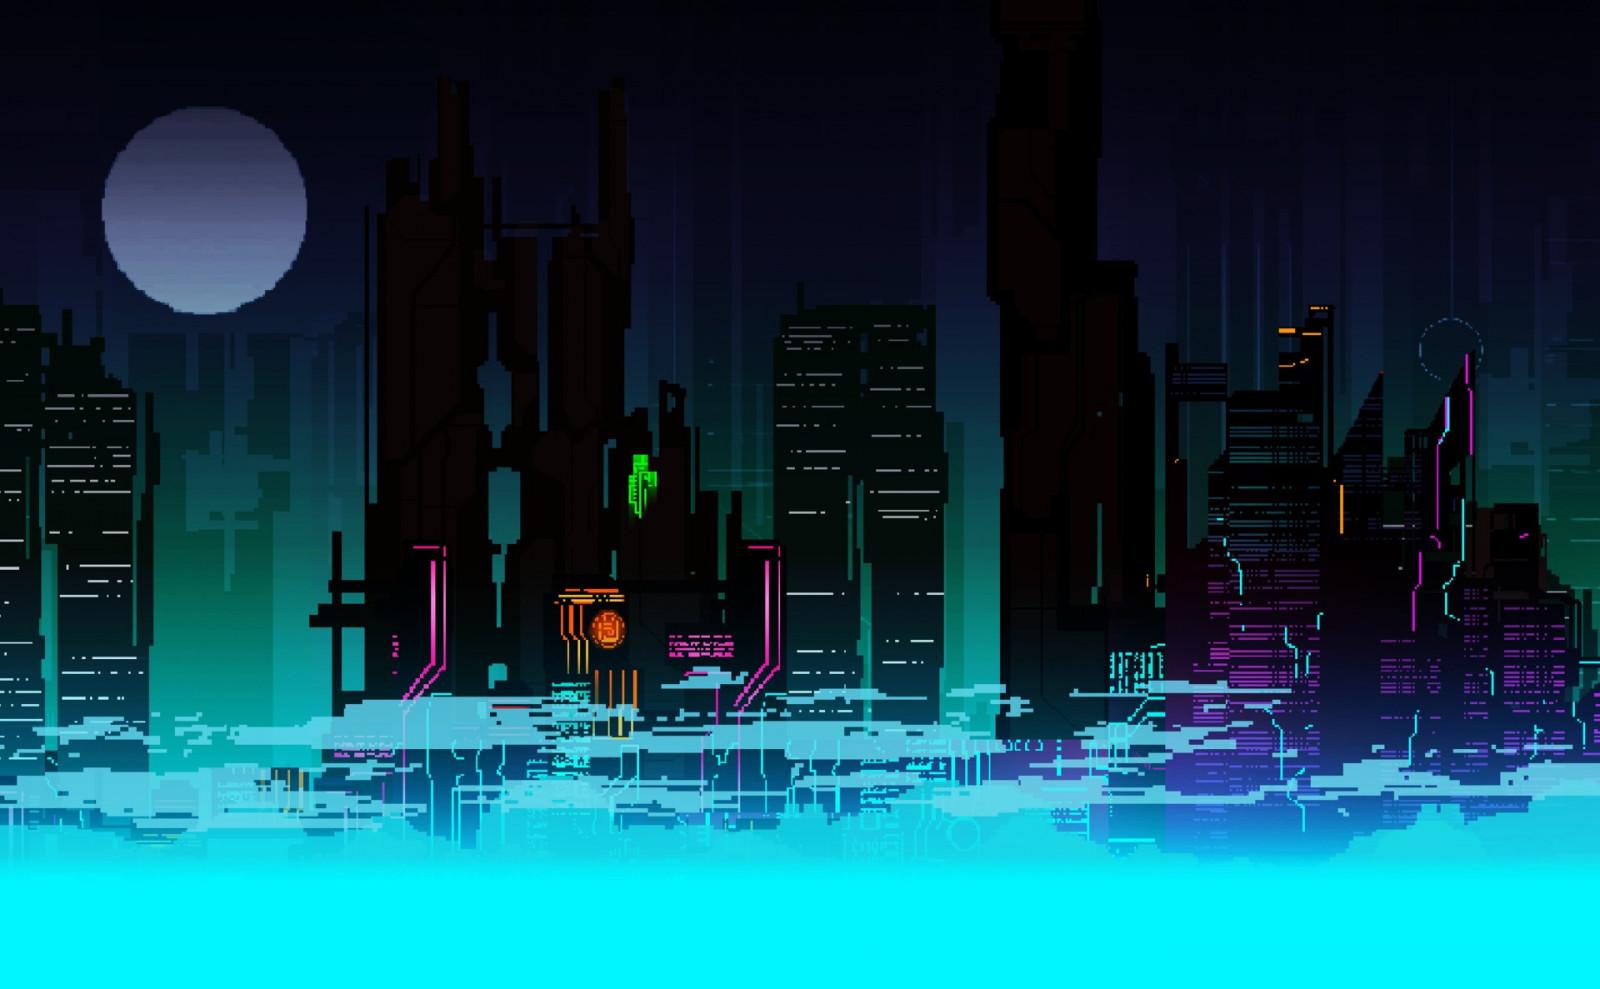 Wallpaper : colorful, digital art, city, cityscape, night ...